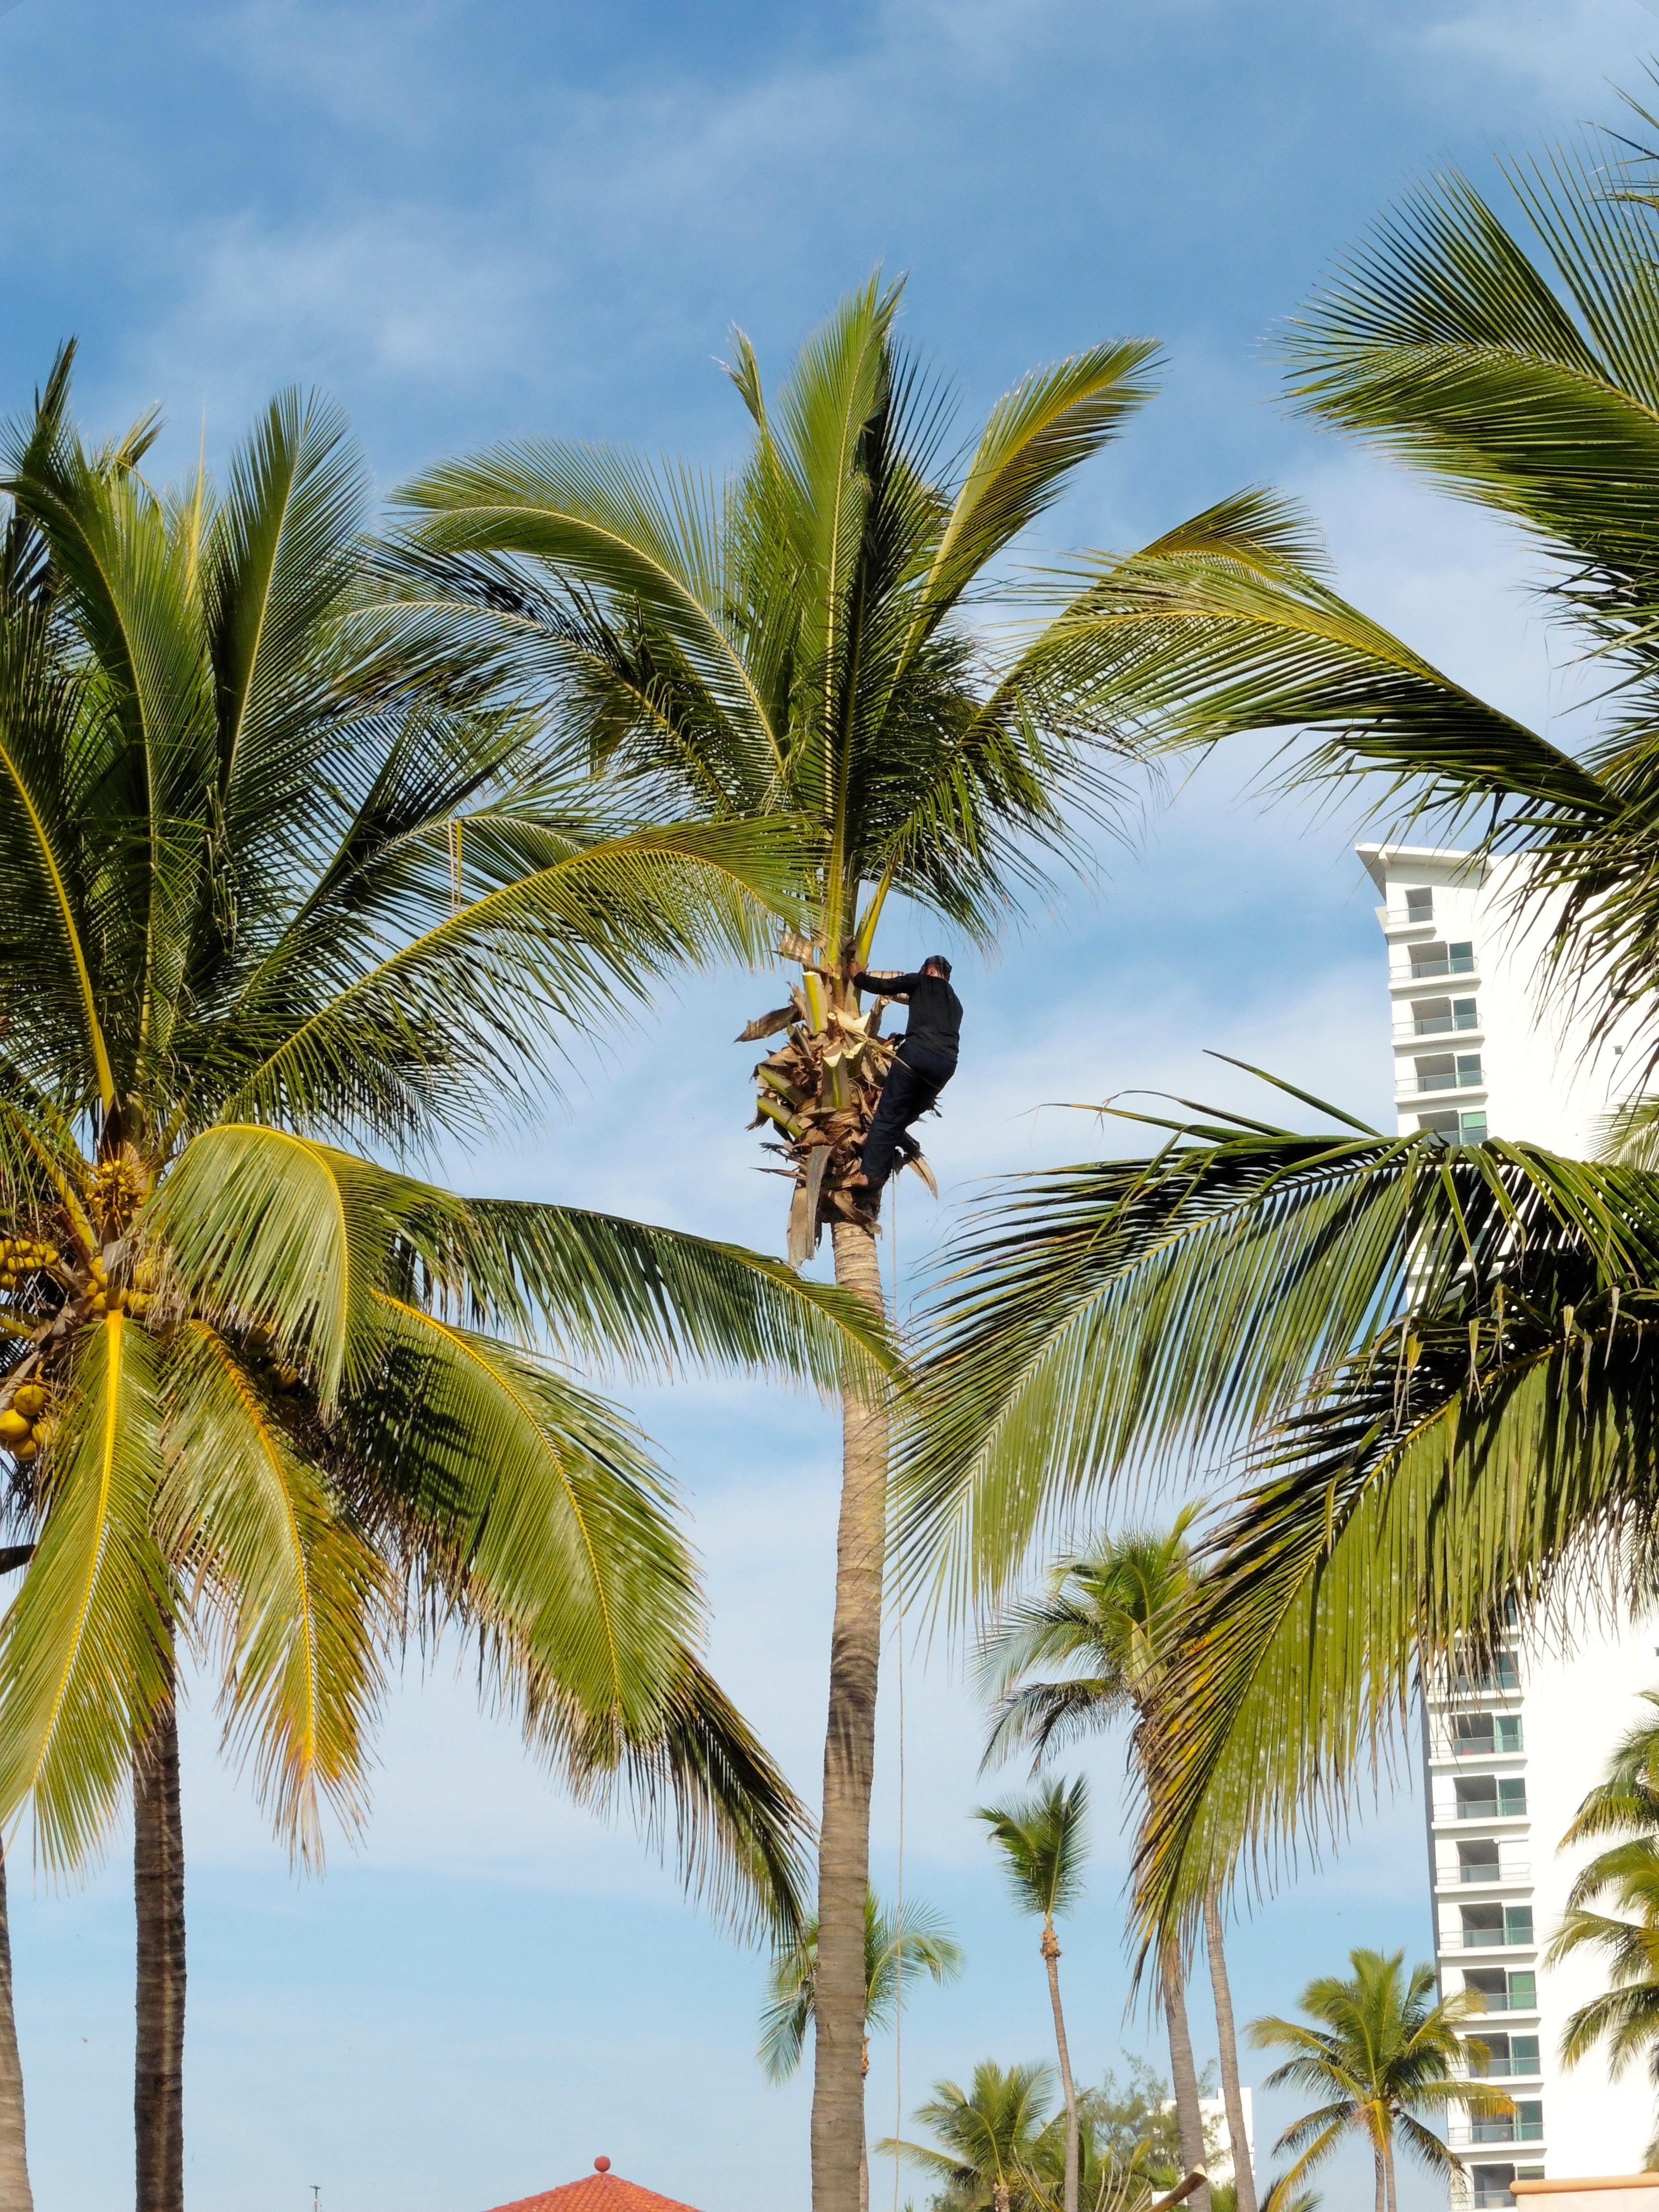 Coconut palm trees - Colorado Traveling Ducks